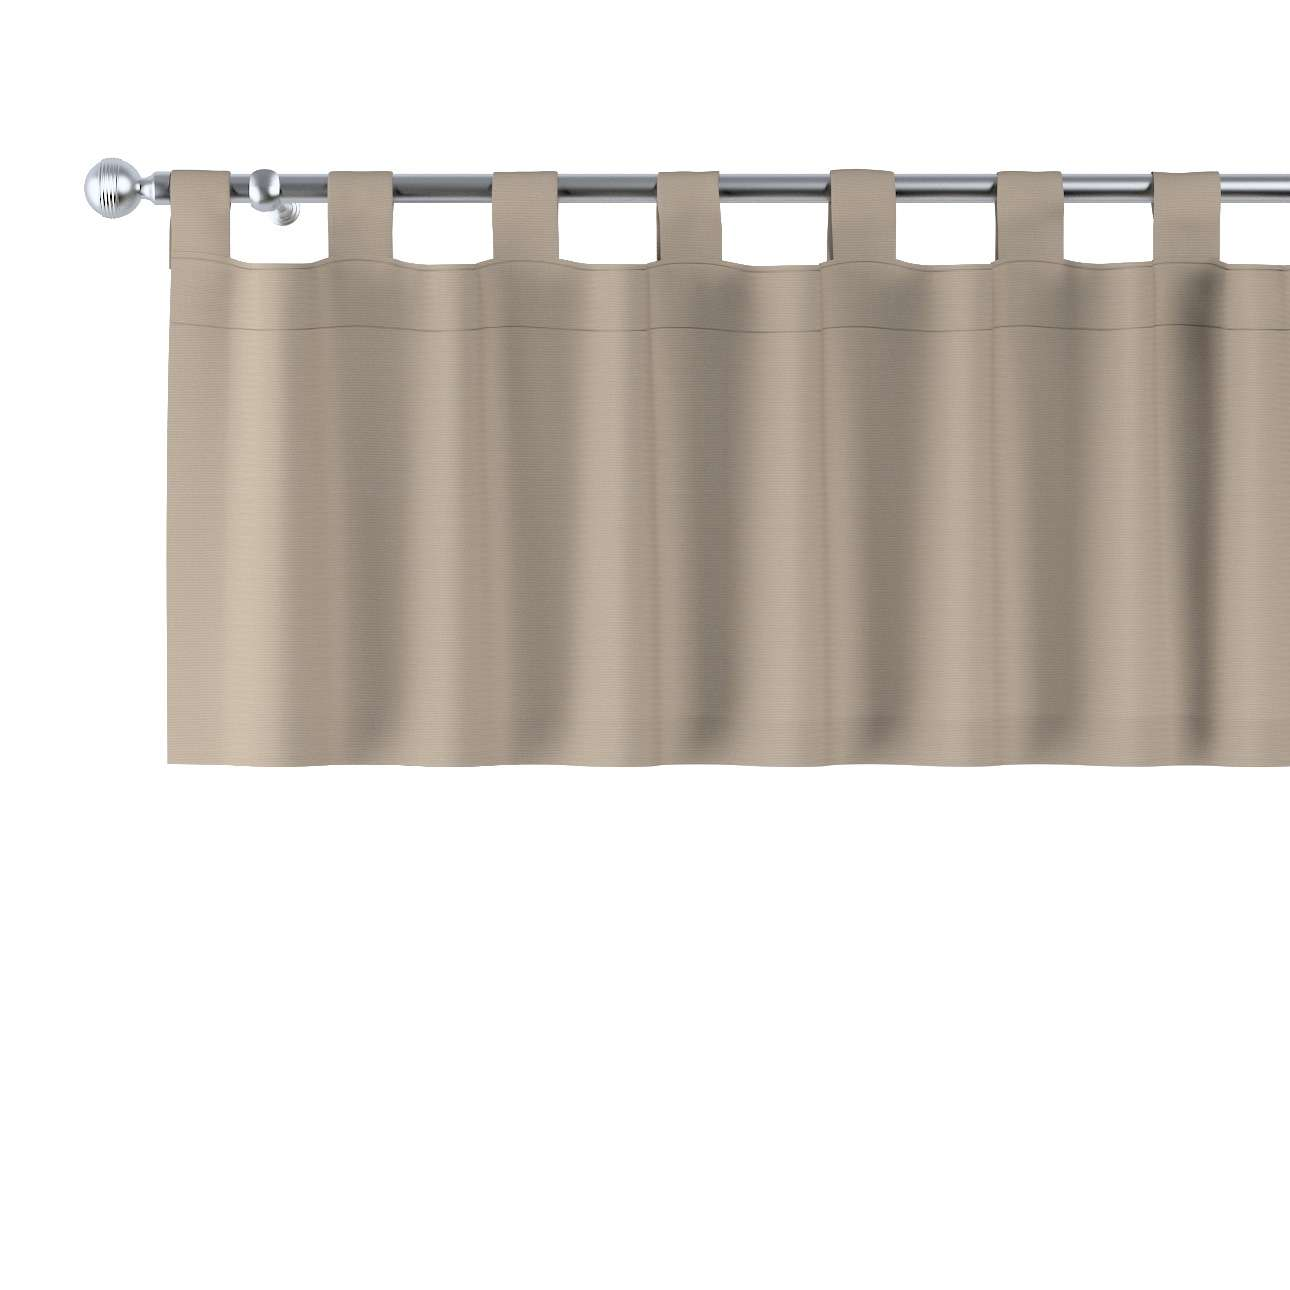 Gardinkappe med stropper 130x40cm fra kollektionen Cotton Panama, Stof: 702-28